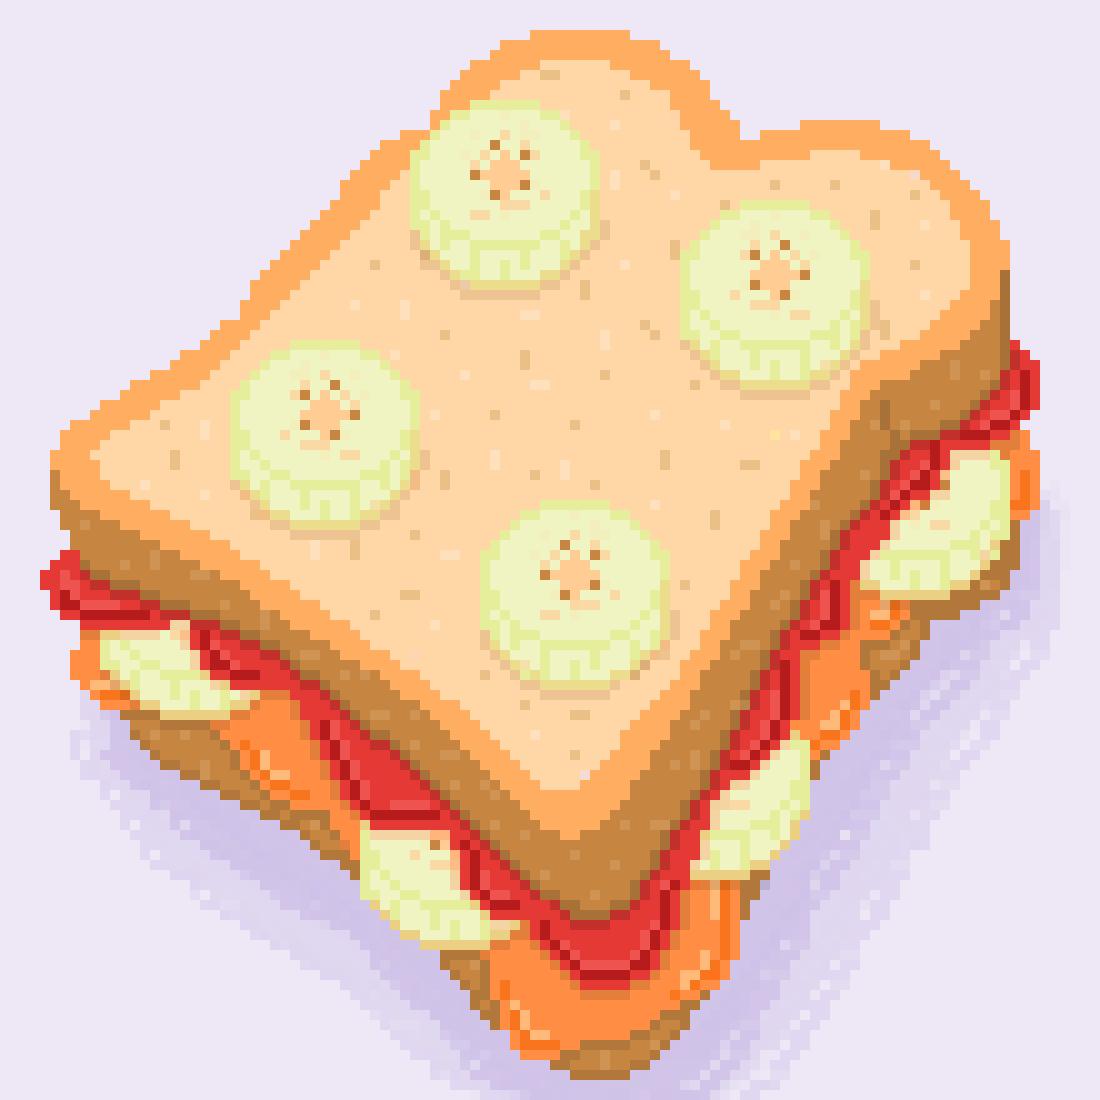 main-image-Banana(Sandwich) 24.03.19  by mamanon